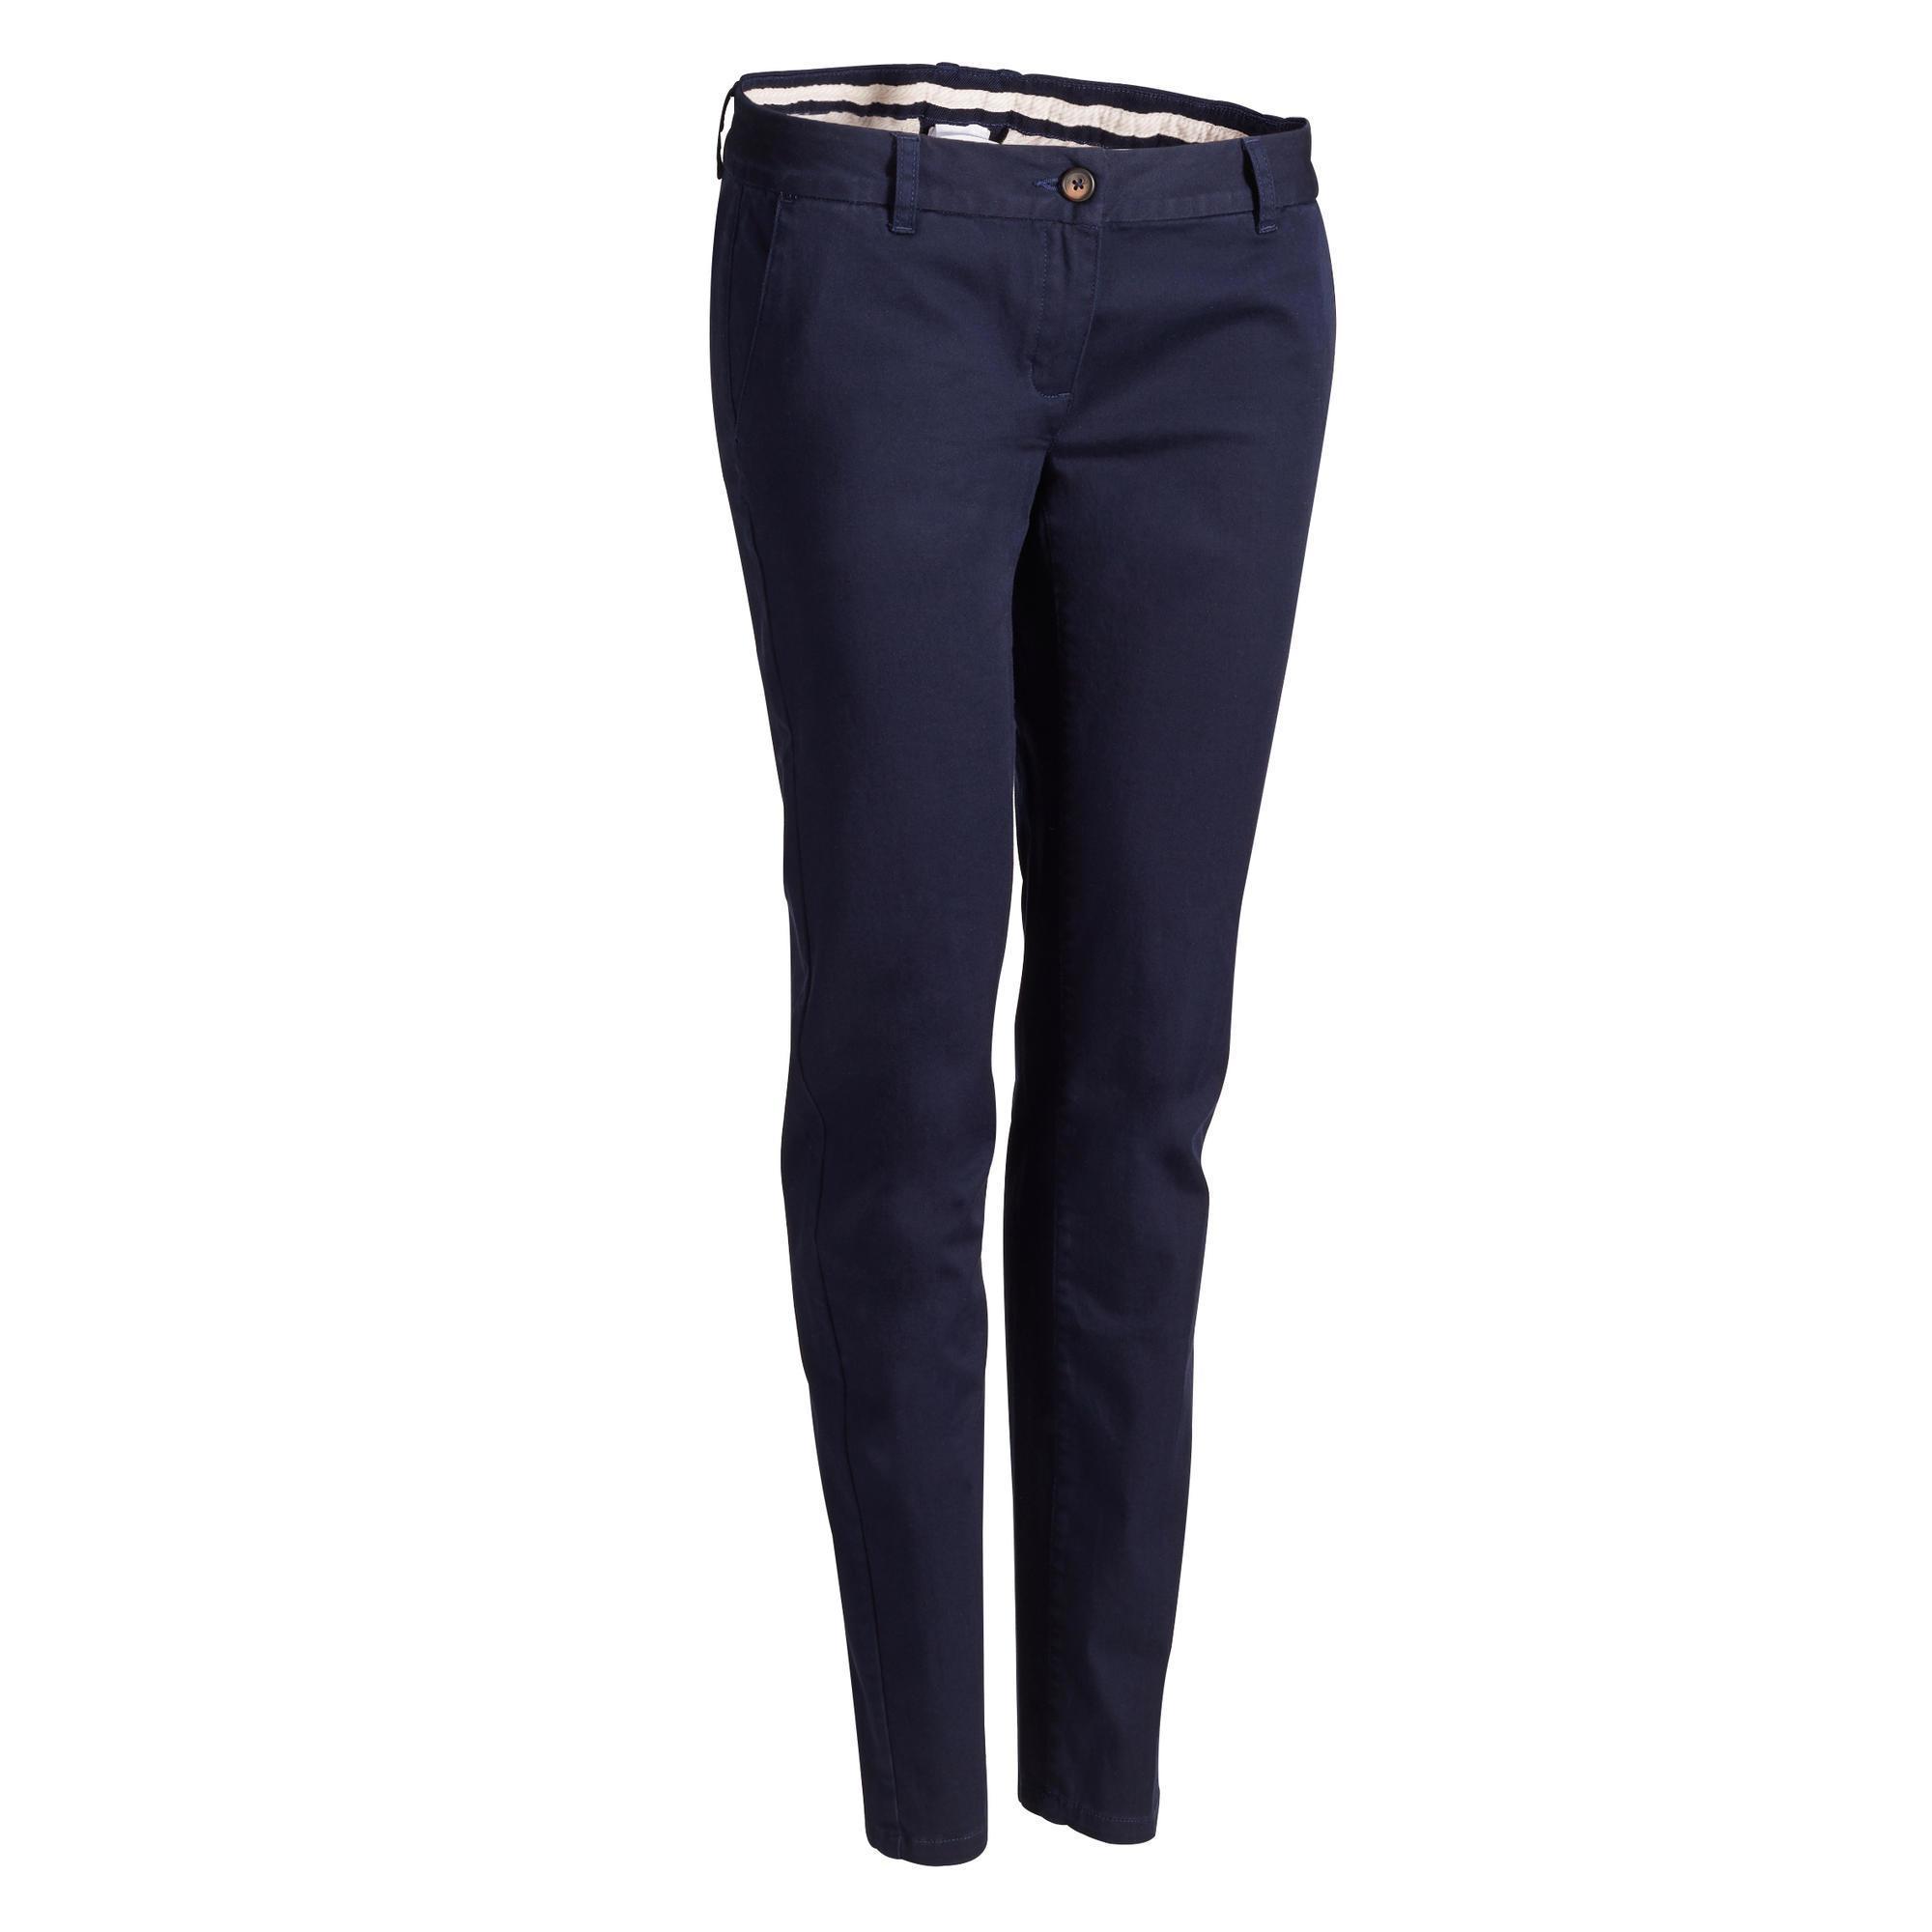 Golfhose Damen marineblau | Sportbekleidung > Sporthosen > Sonstige Sporthosen | Inesis